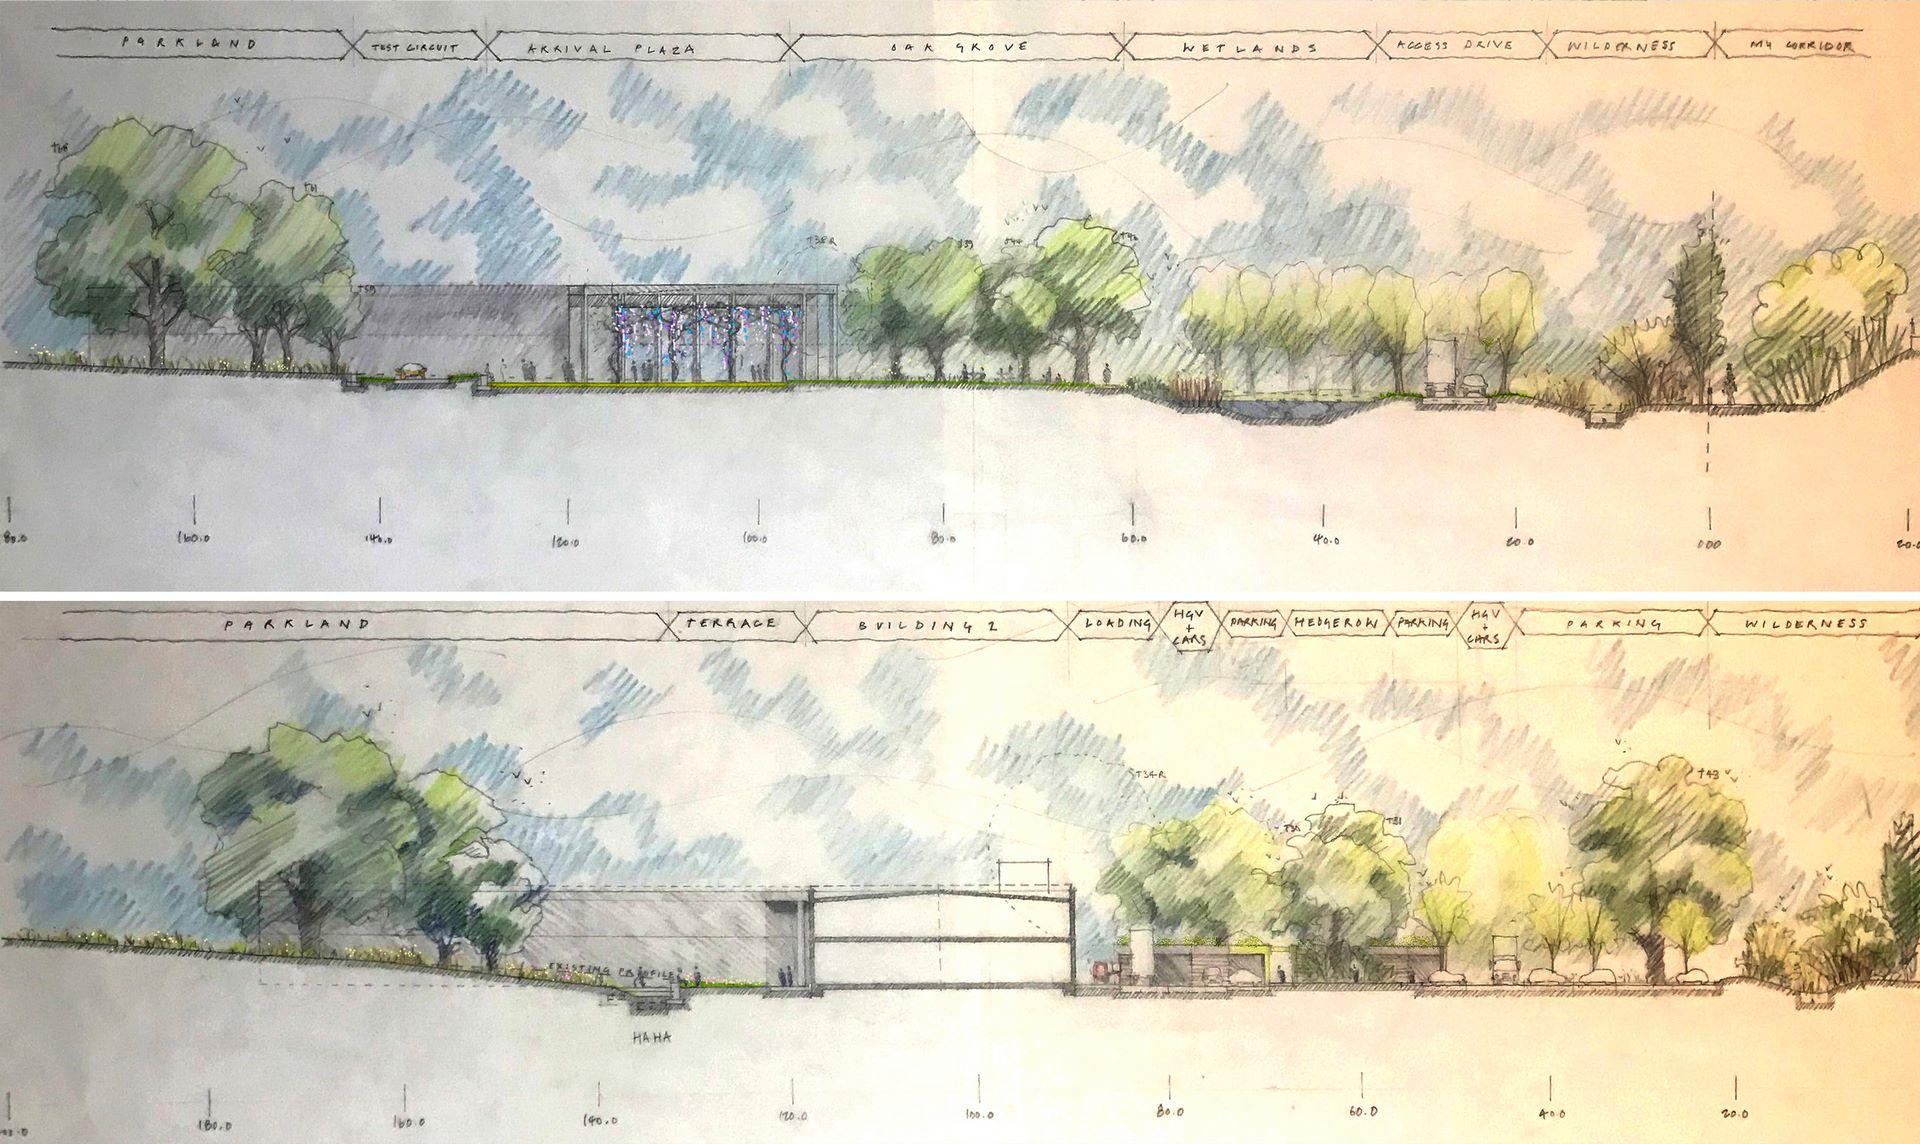 Gordon-Murray-Group-HQ-Masterplan-Drawing-1